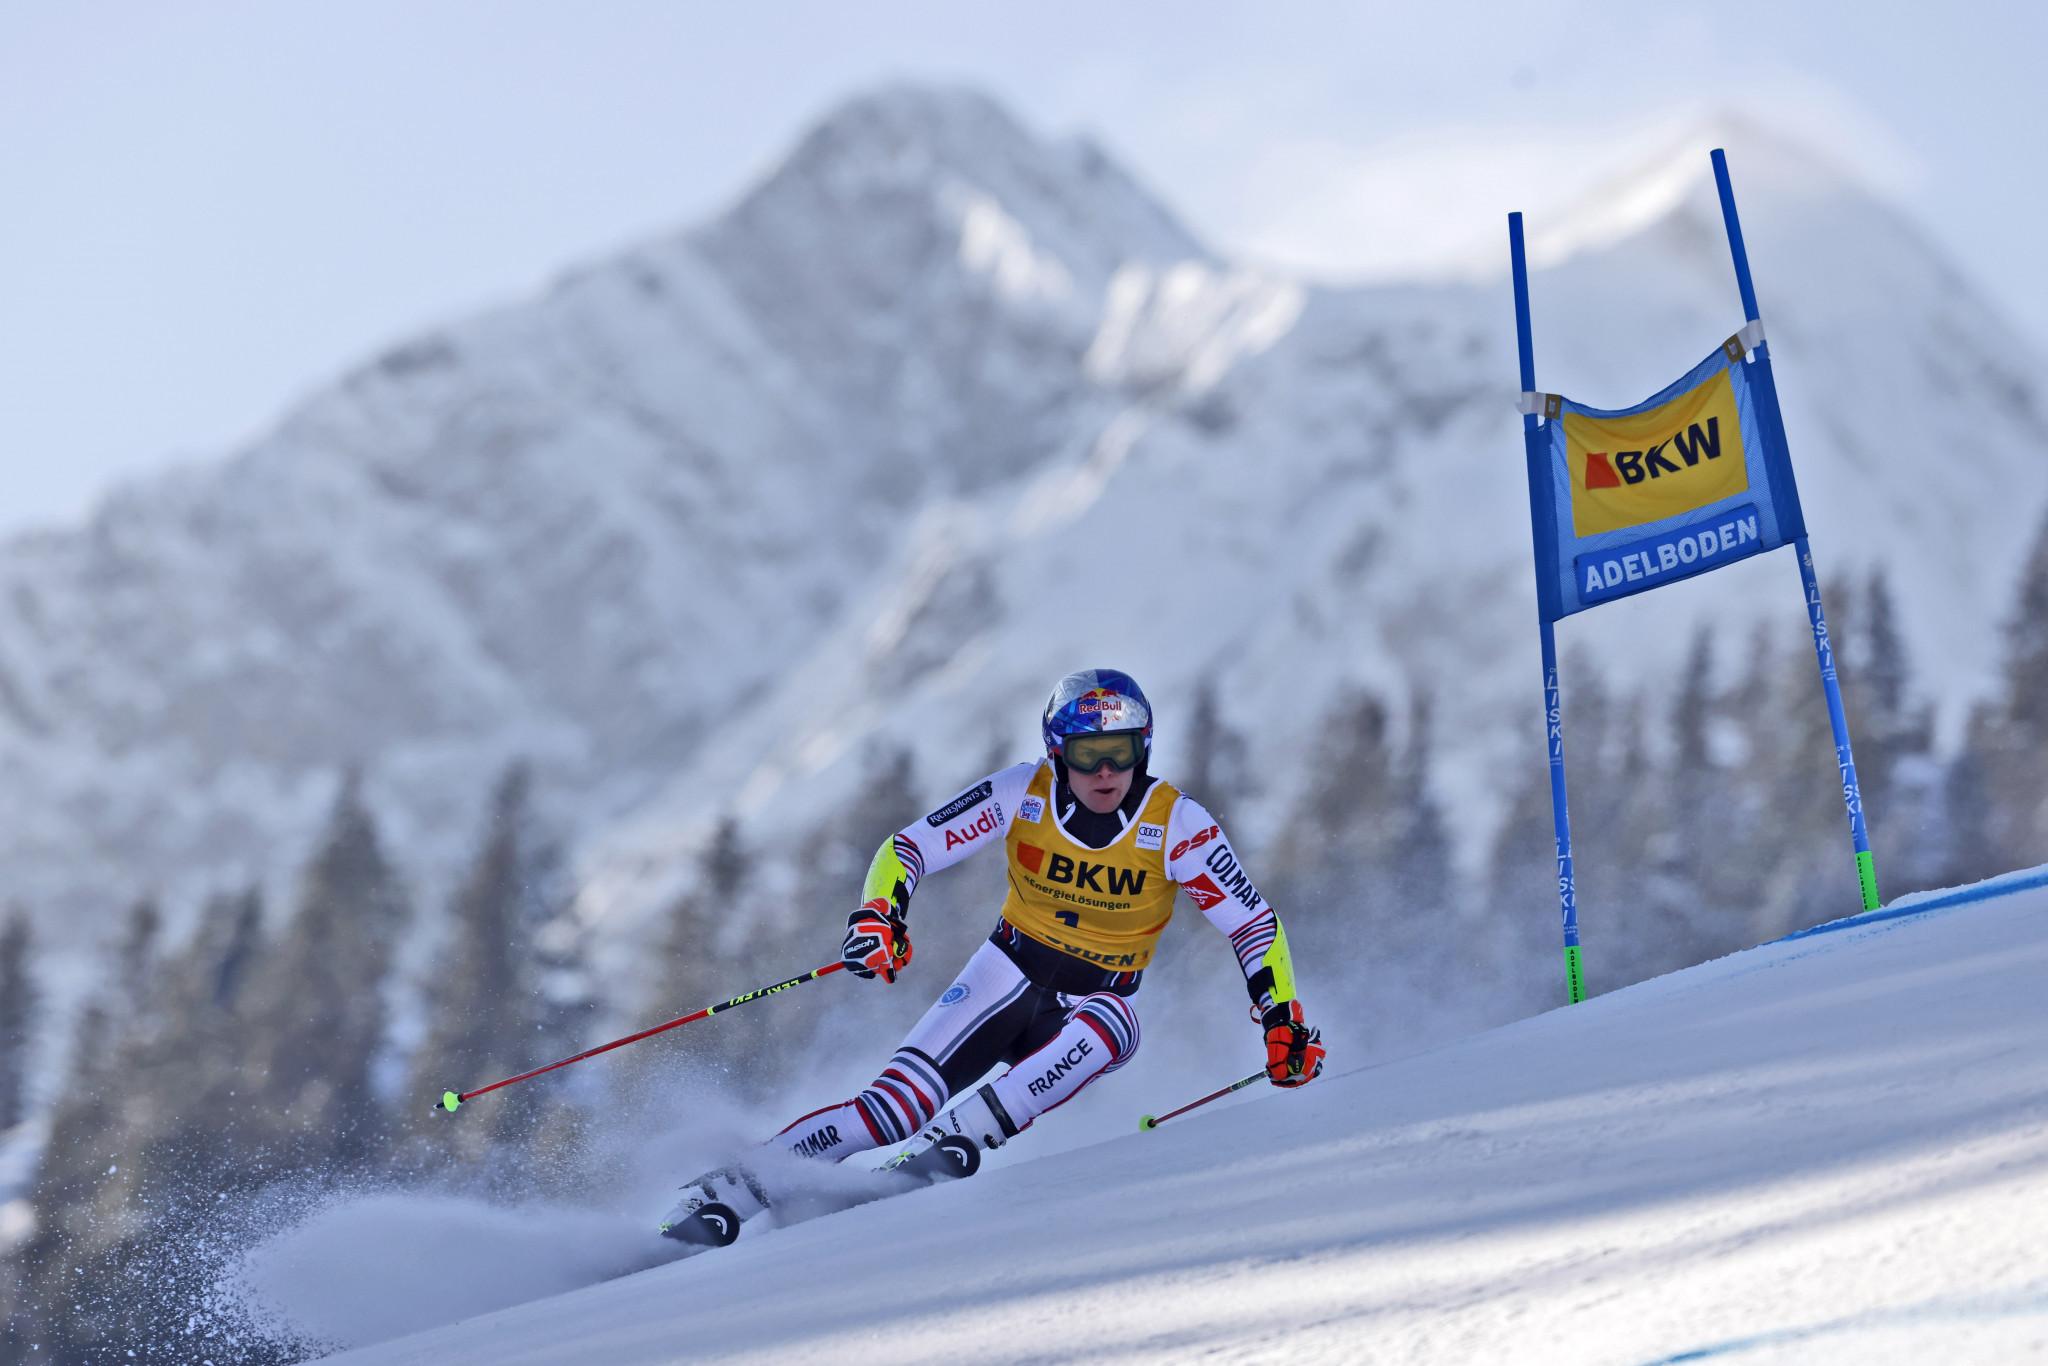 Pinturault dominates men's giant slalom competition in Adelboden